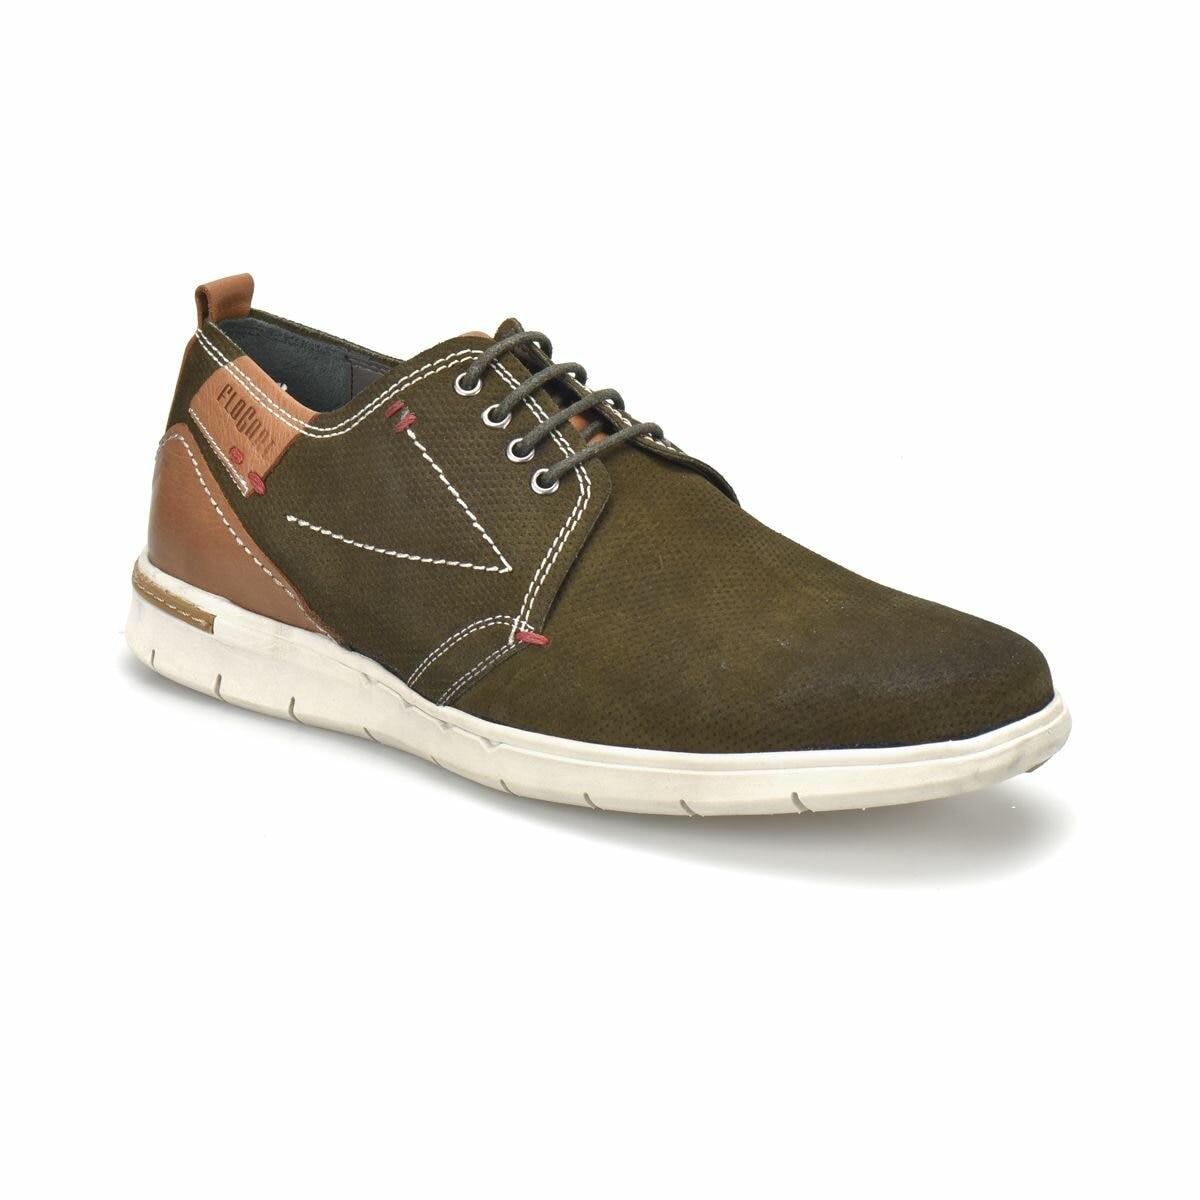 FLO 321 M 1492 Khaki Men 'S Modern Shoes Flogart